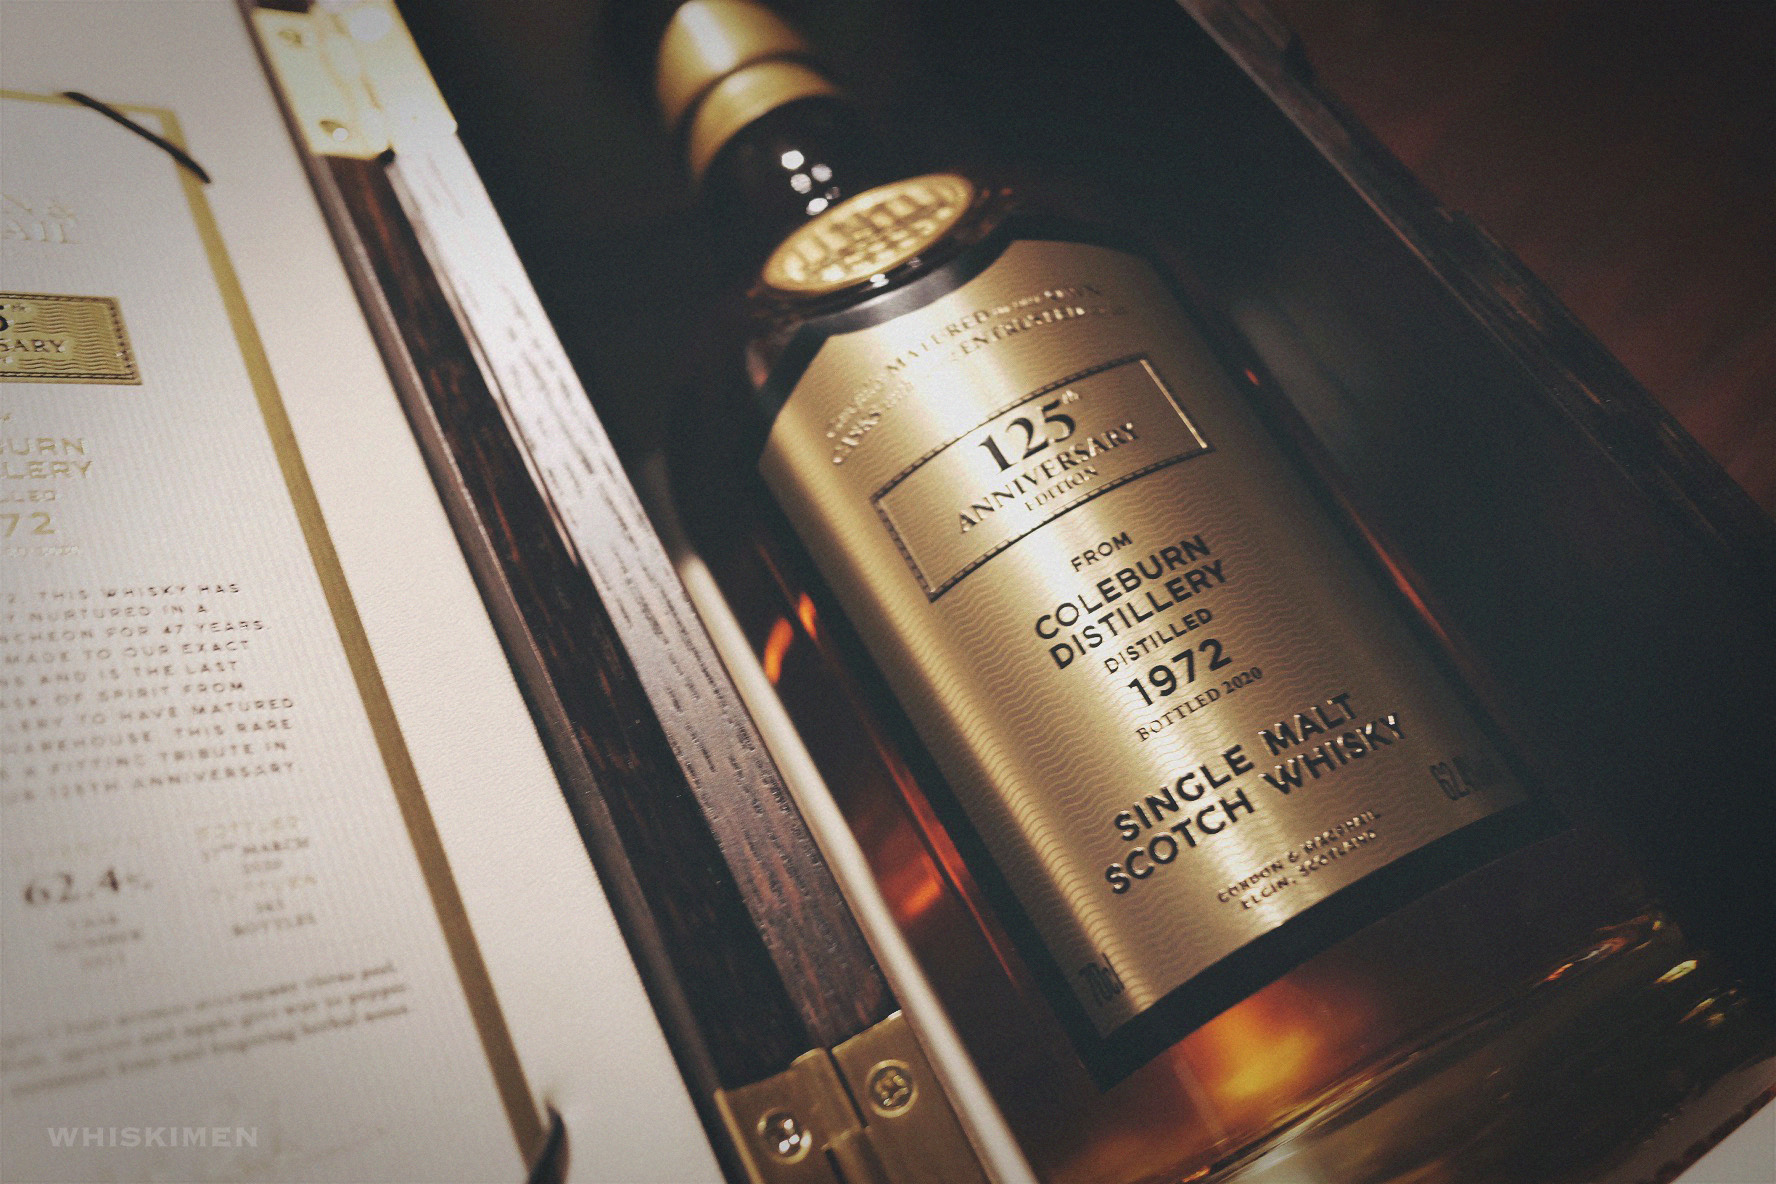 Gordon & MacPhail Last Cask Series Coleburn 1972 47 Year Old Single Malt Scotch Whisky 125th Anniversary